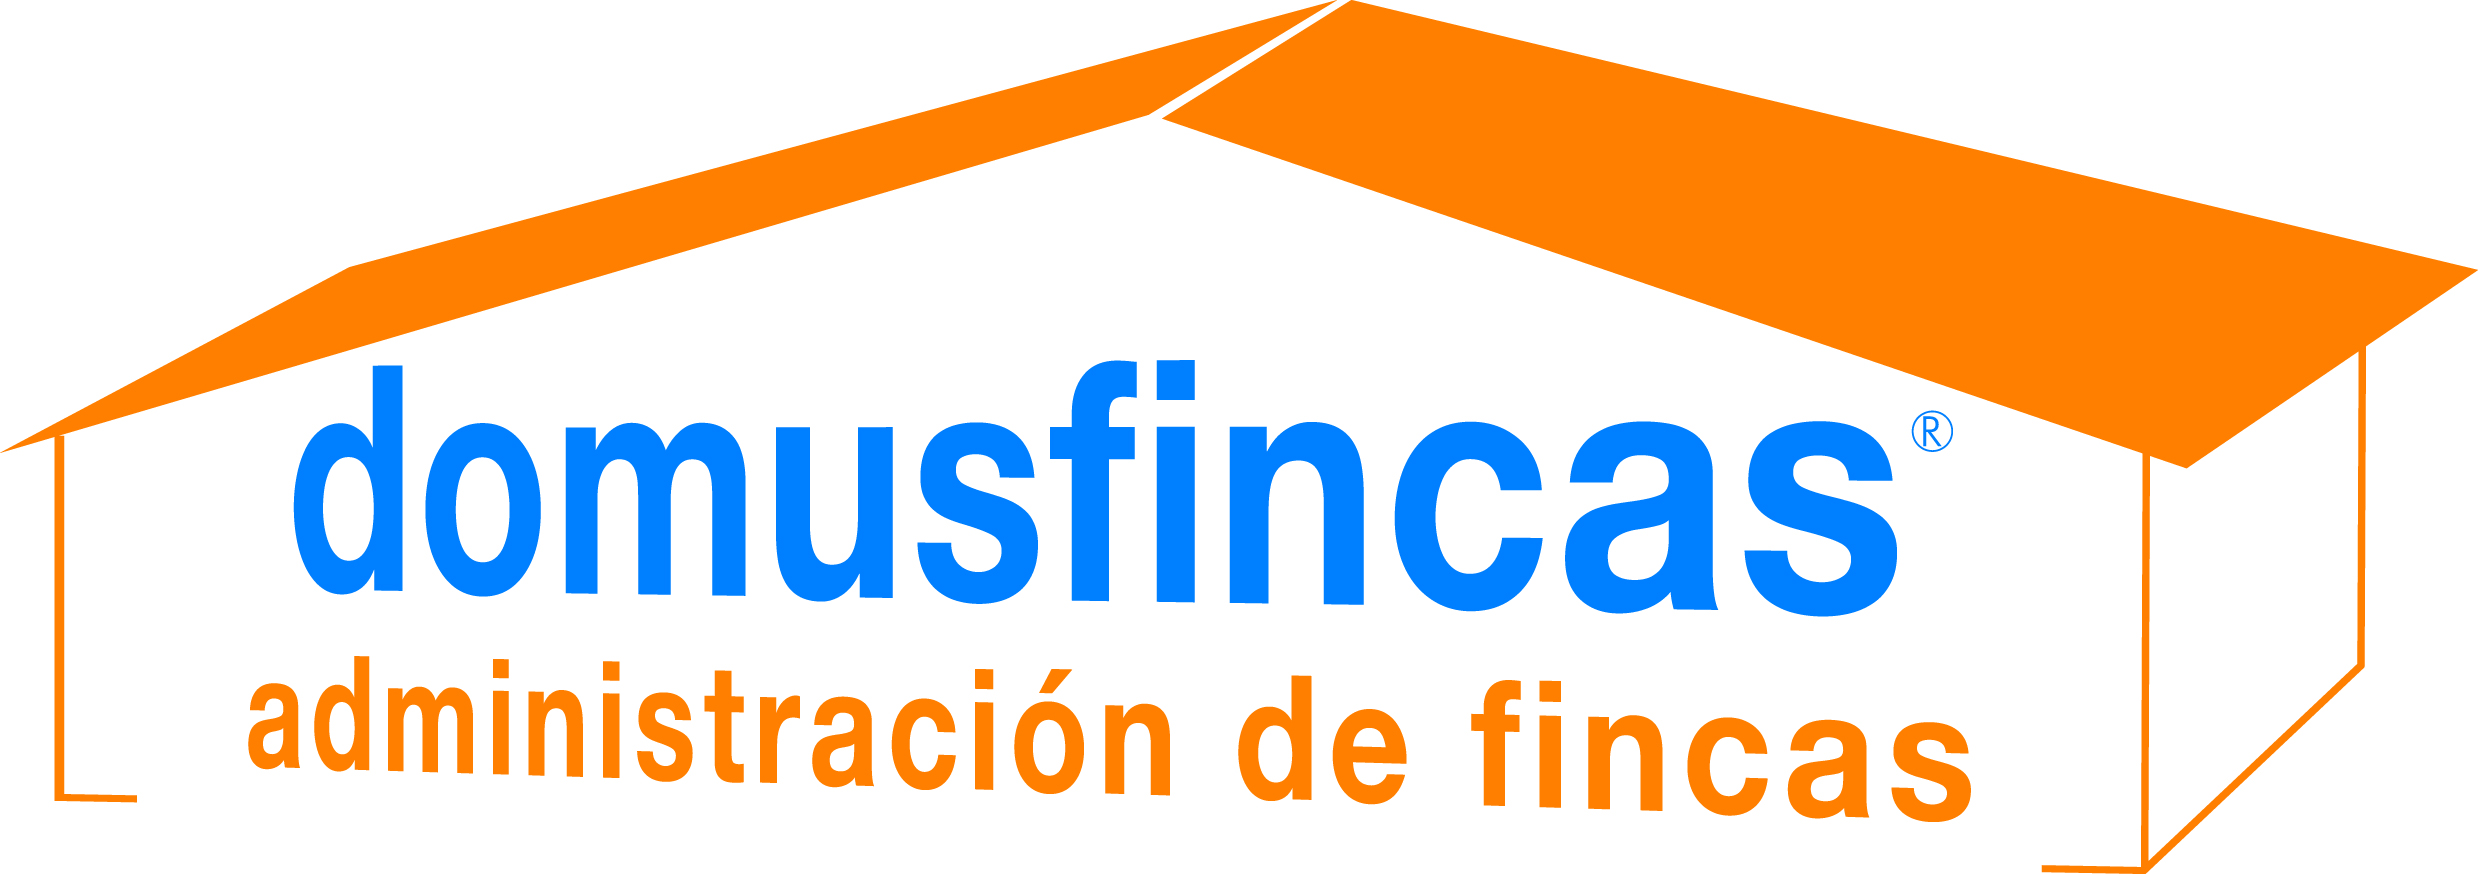 DOMUSFINCAS 2019 ©_Administradores de fincas en Madrid